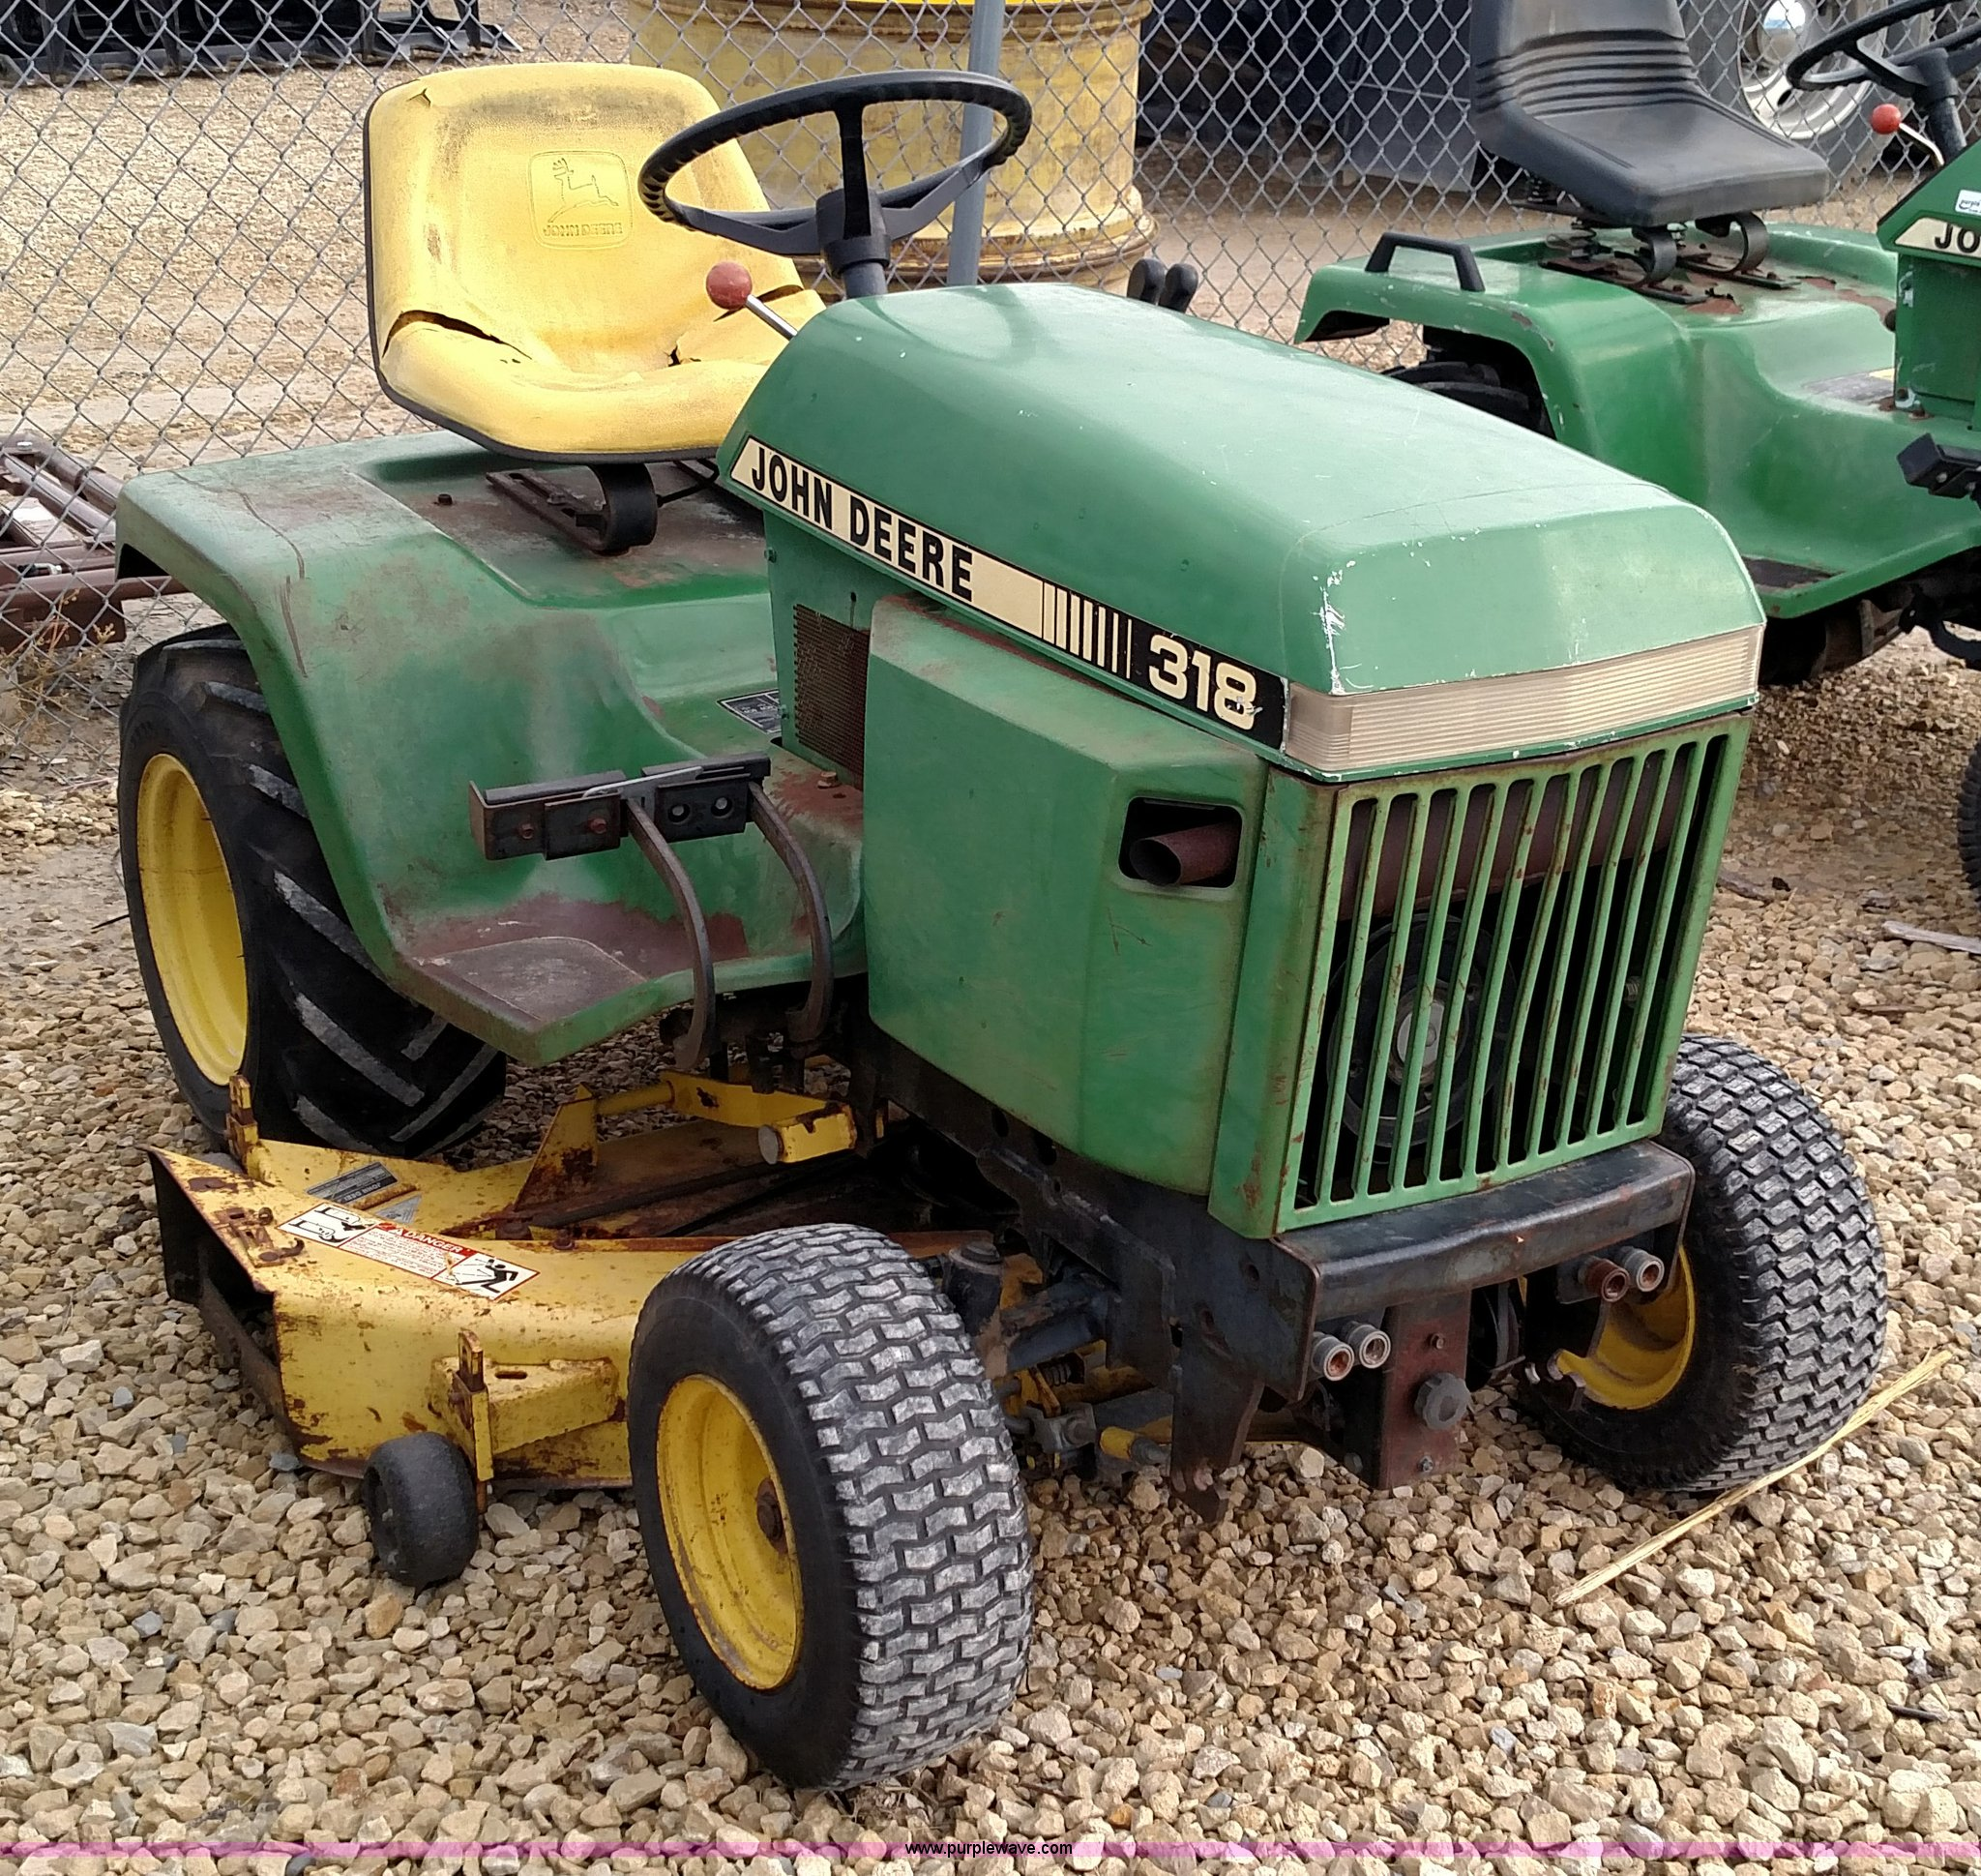 John Deere 318 >> John Deere 318 Lawn Mower Item Br9422 Sold December 29